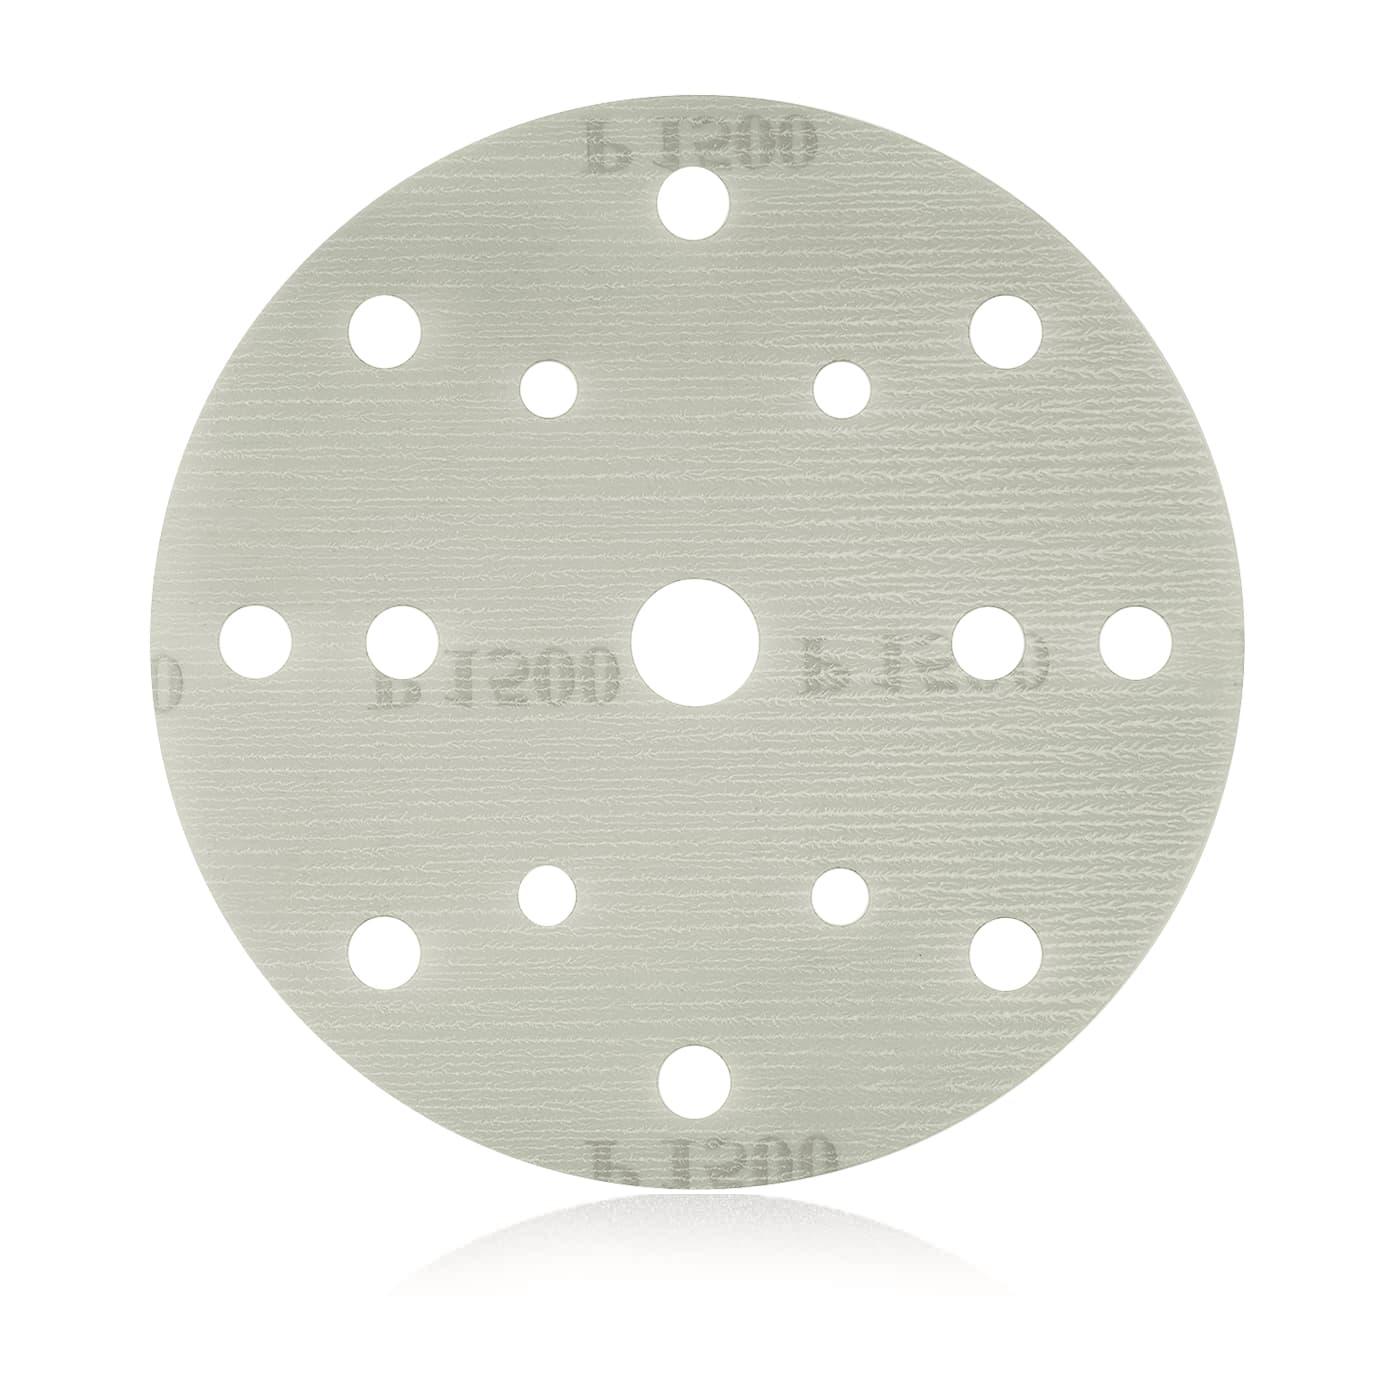 830 Film velour discs